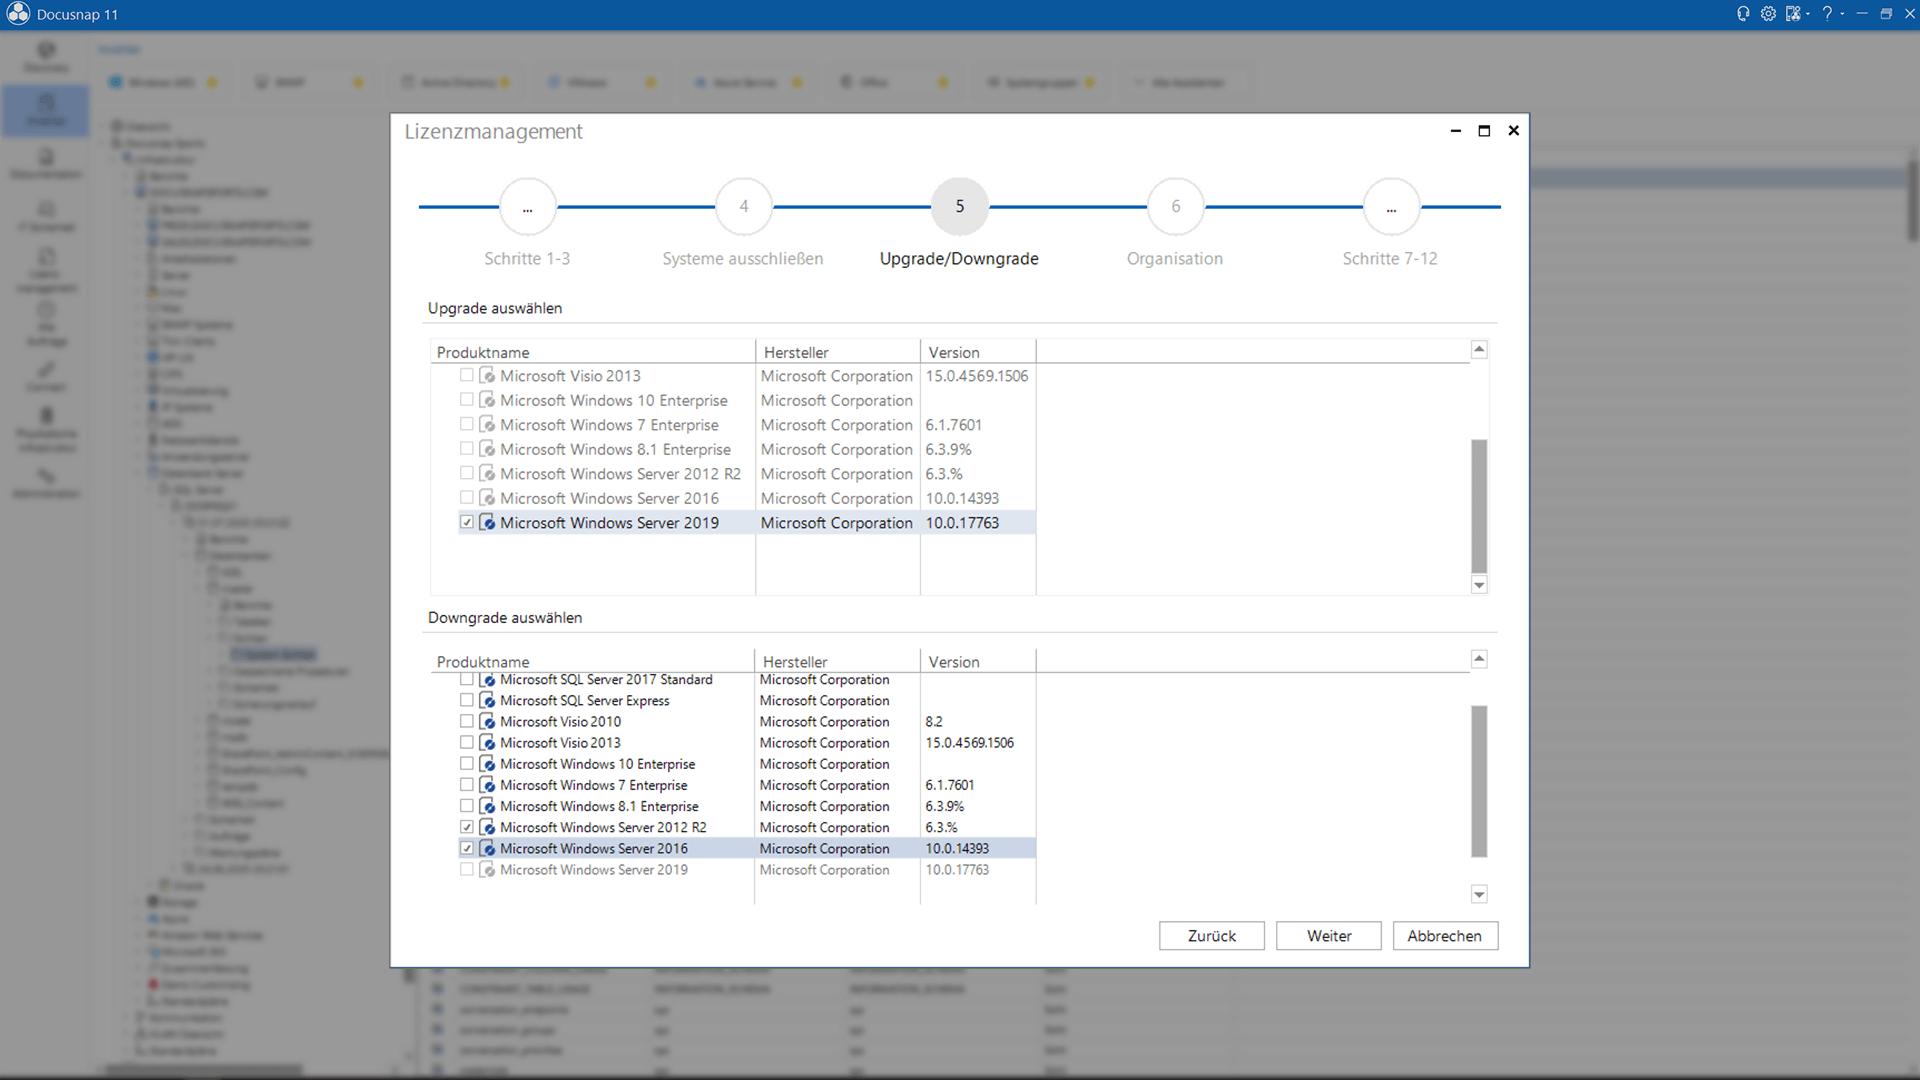 Lizenz-Assistent Upgrade-Downgrade-Funktion